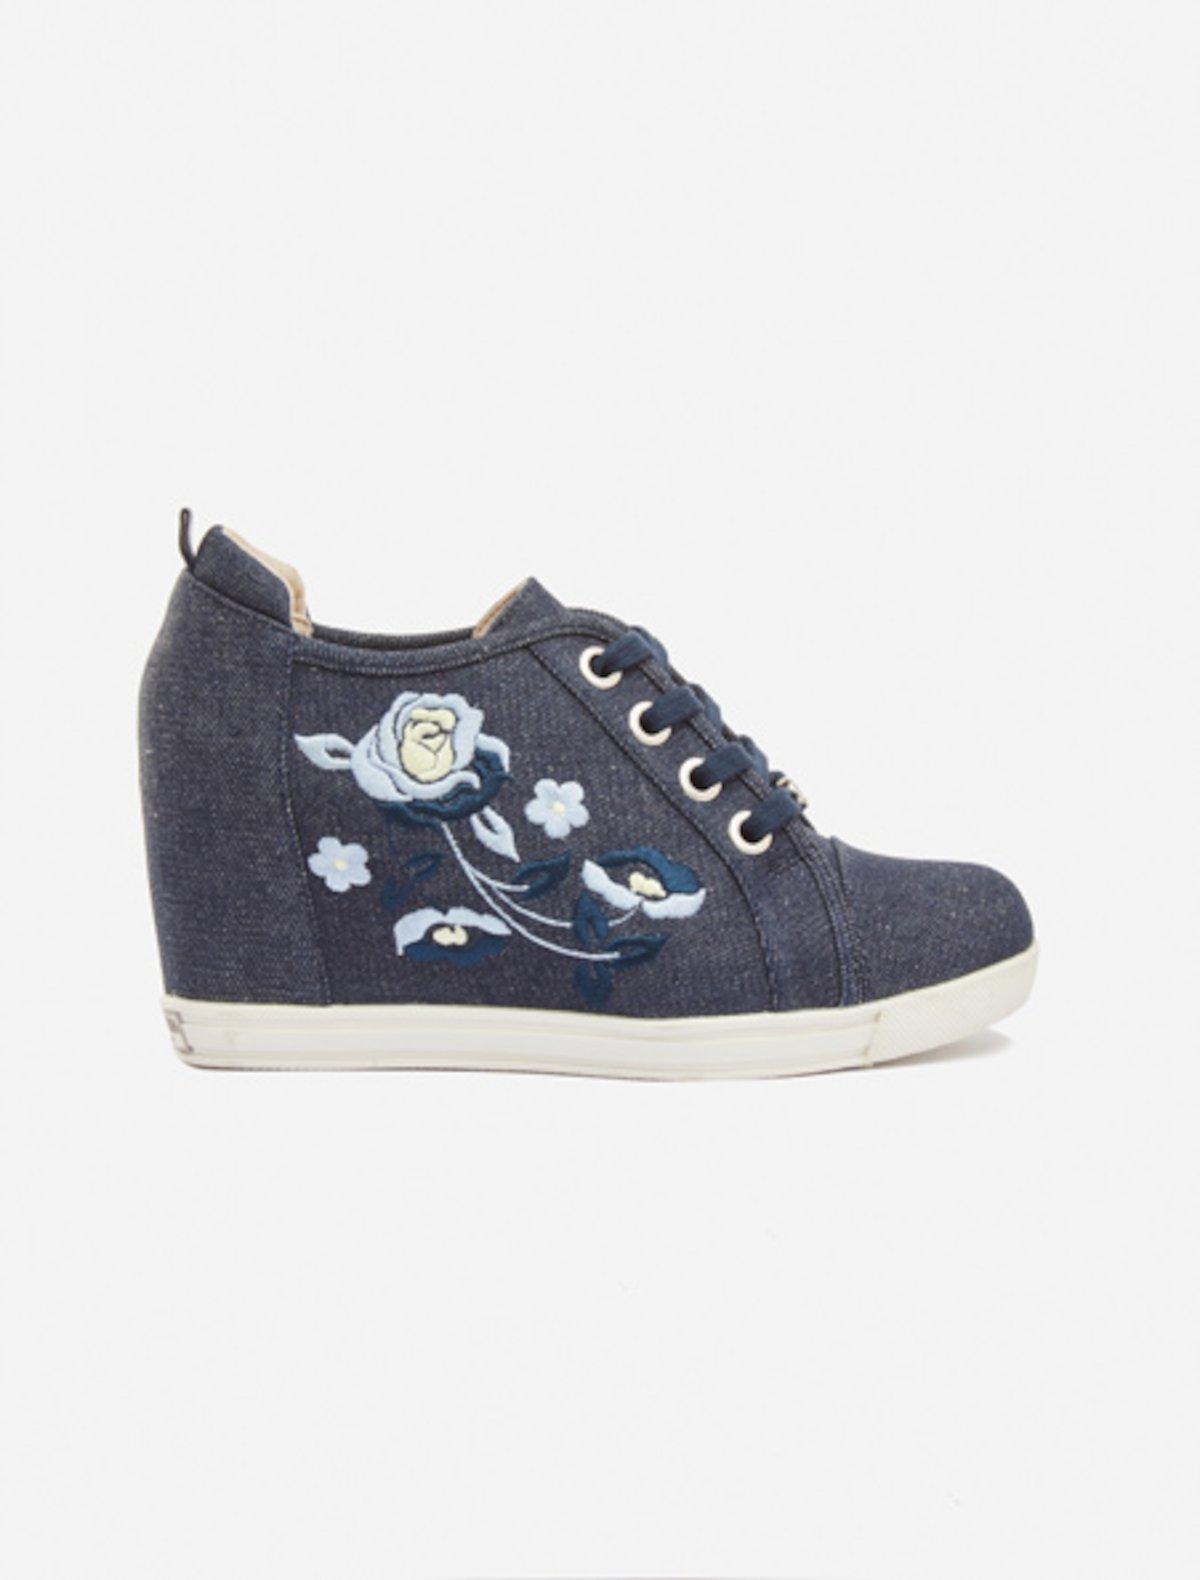 Samantha floral embroidery denim shoes - Dark Denim